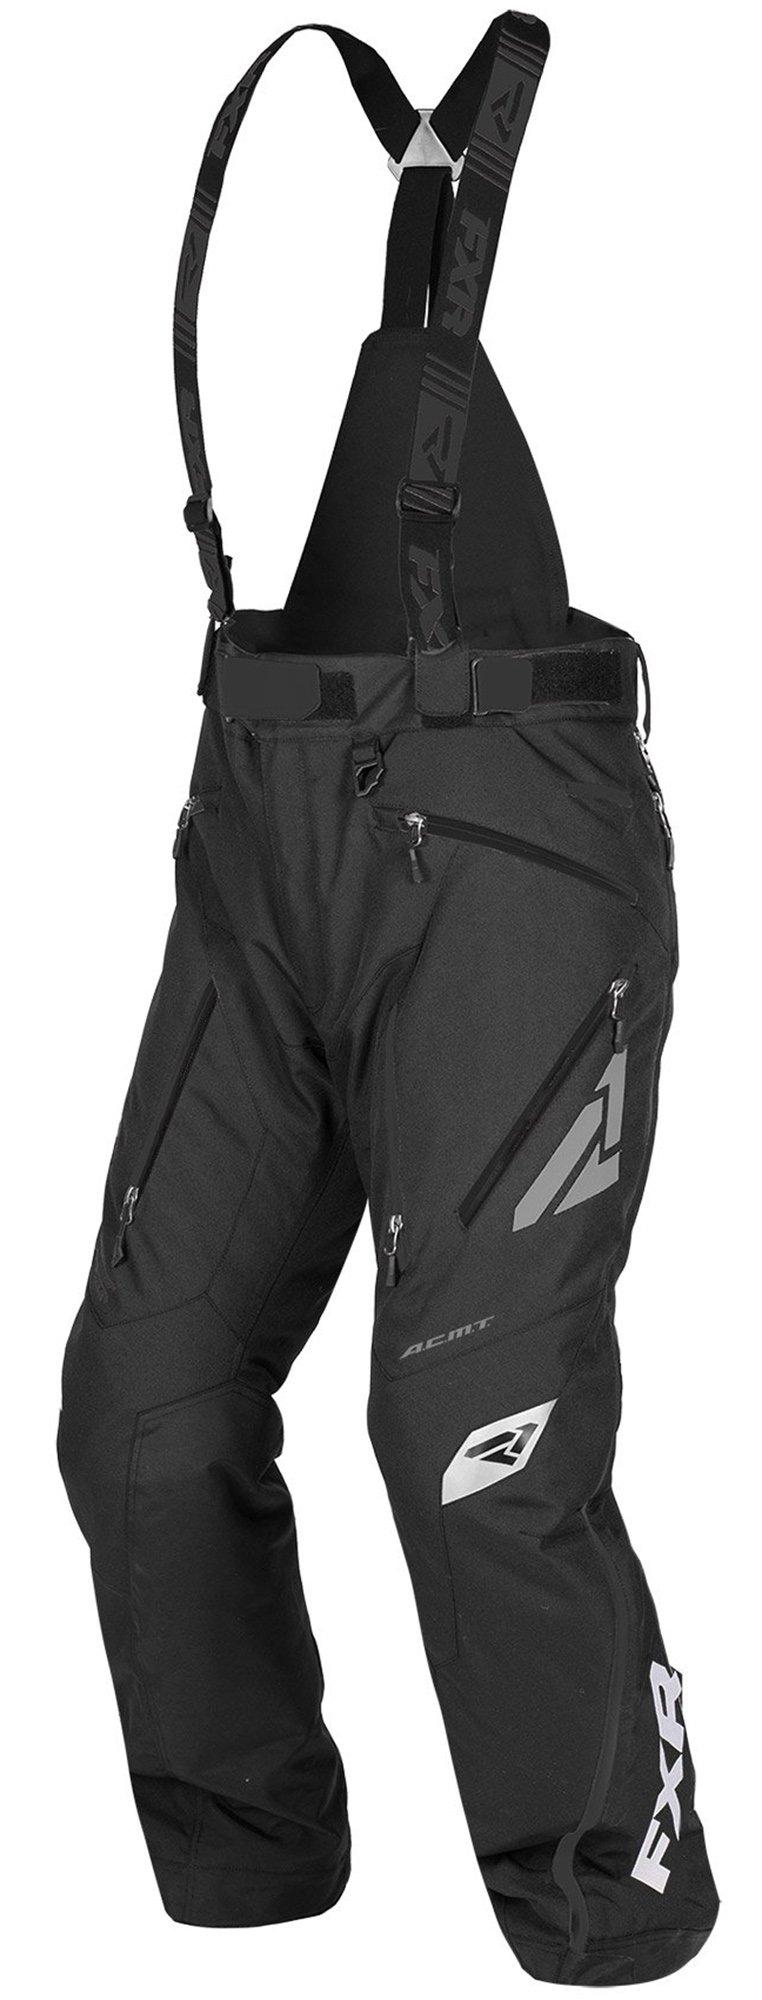 Снегоходные брюки FXR MISSION X 19 Black